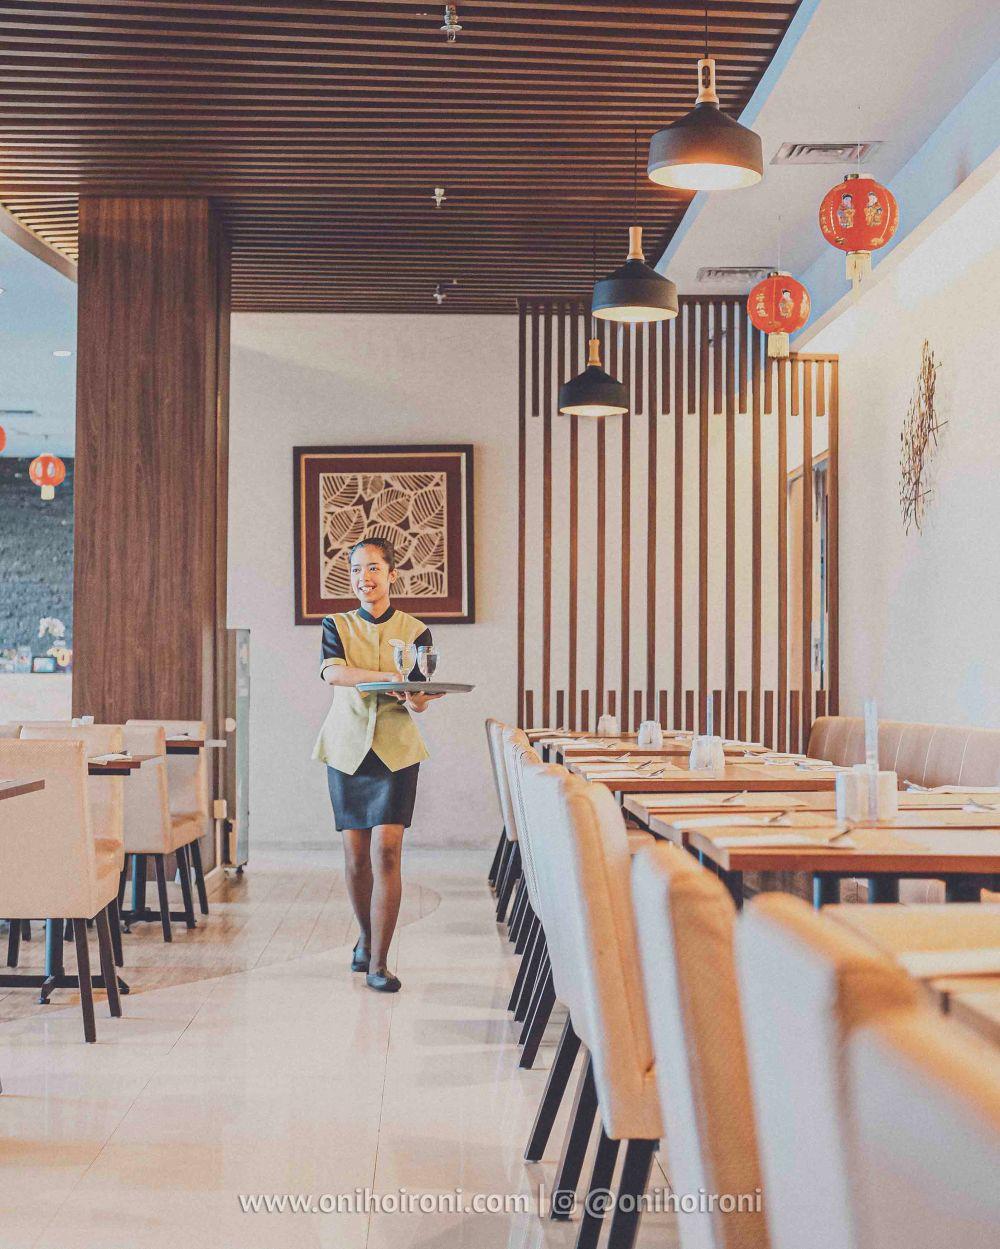 2 Restaurant Review Hotel Grand Whiz Poins Simatupang Jakarta oni hoironi